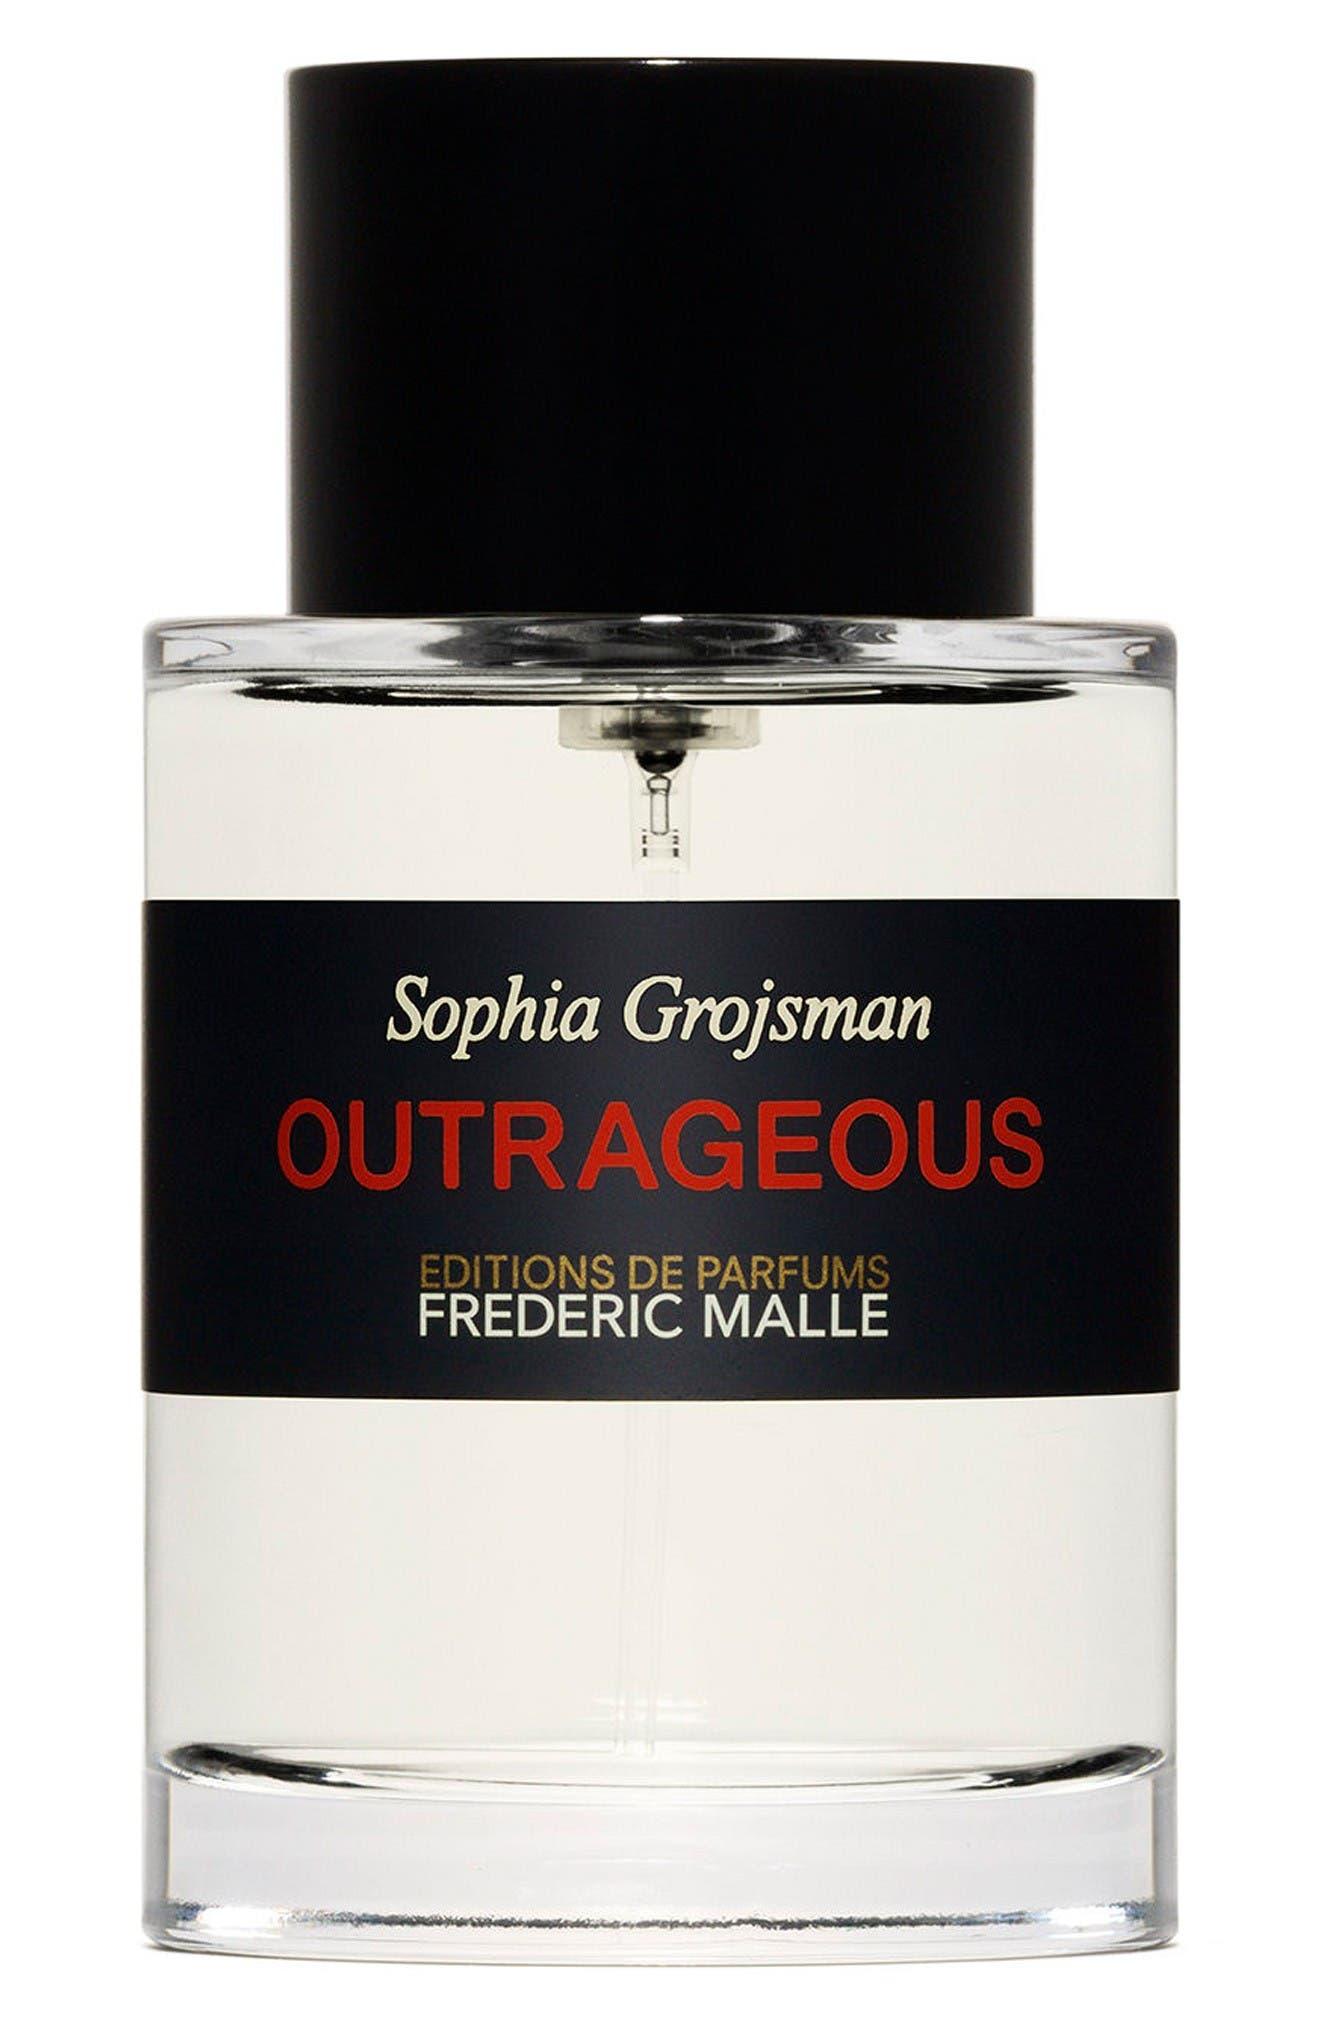 Editions de Perfumes Frédéric Malle Outrageous Spray